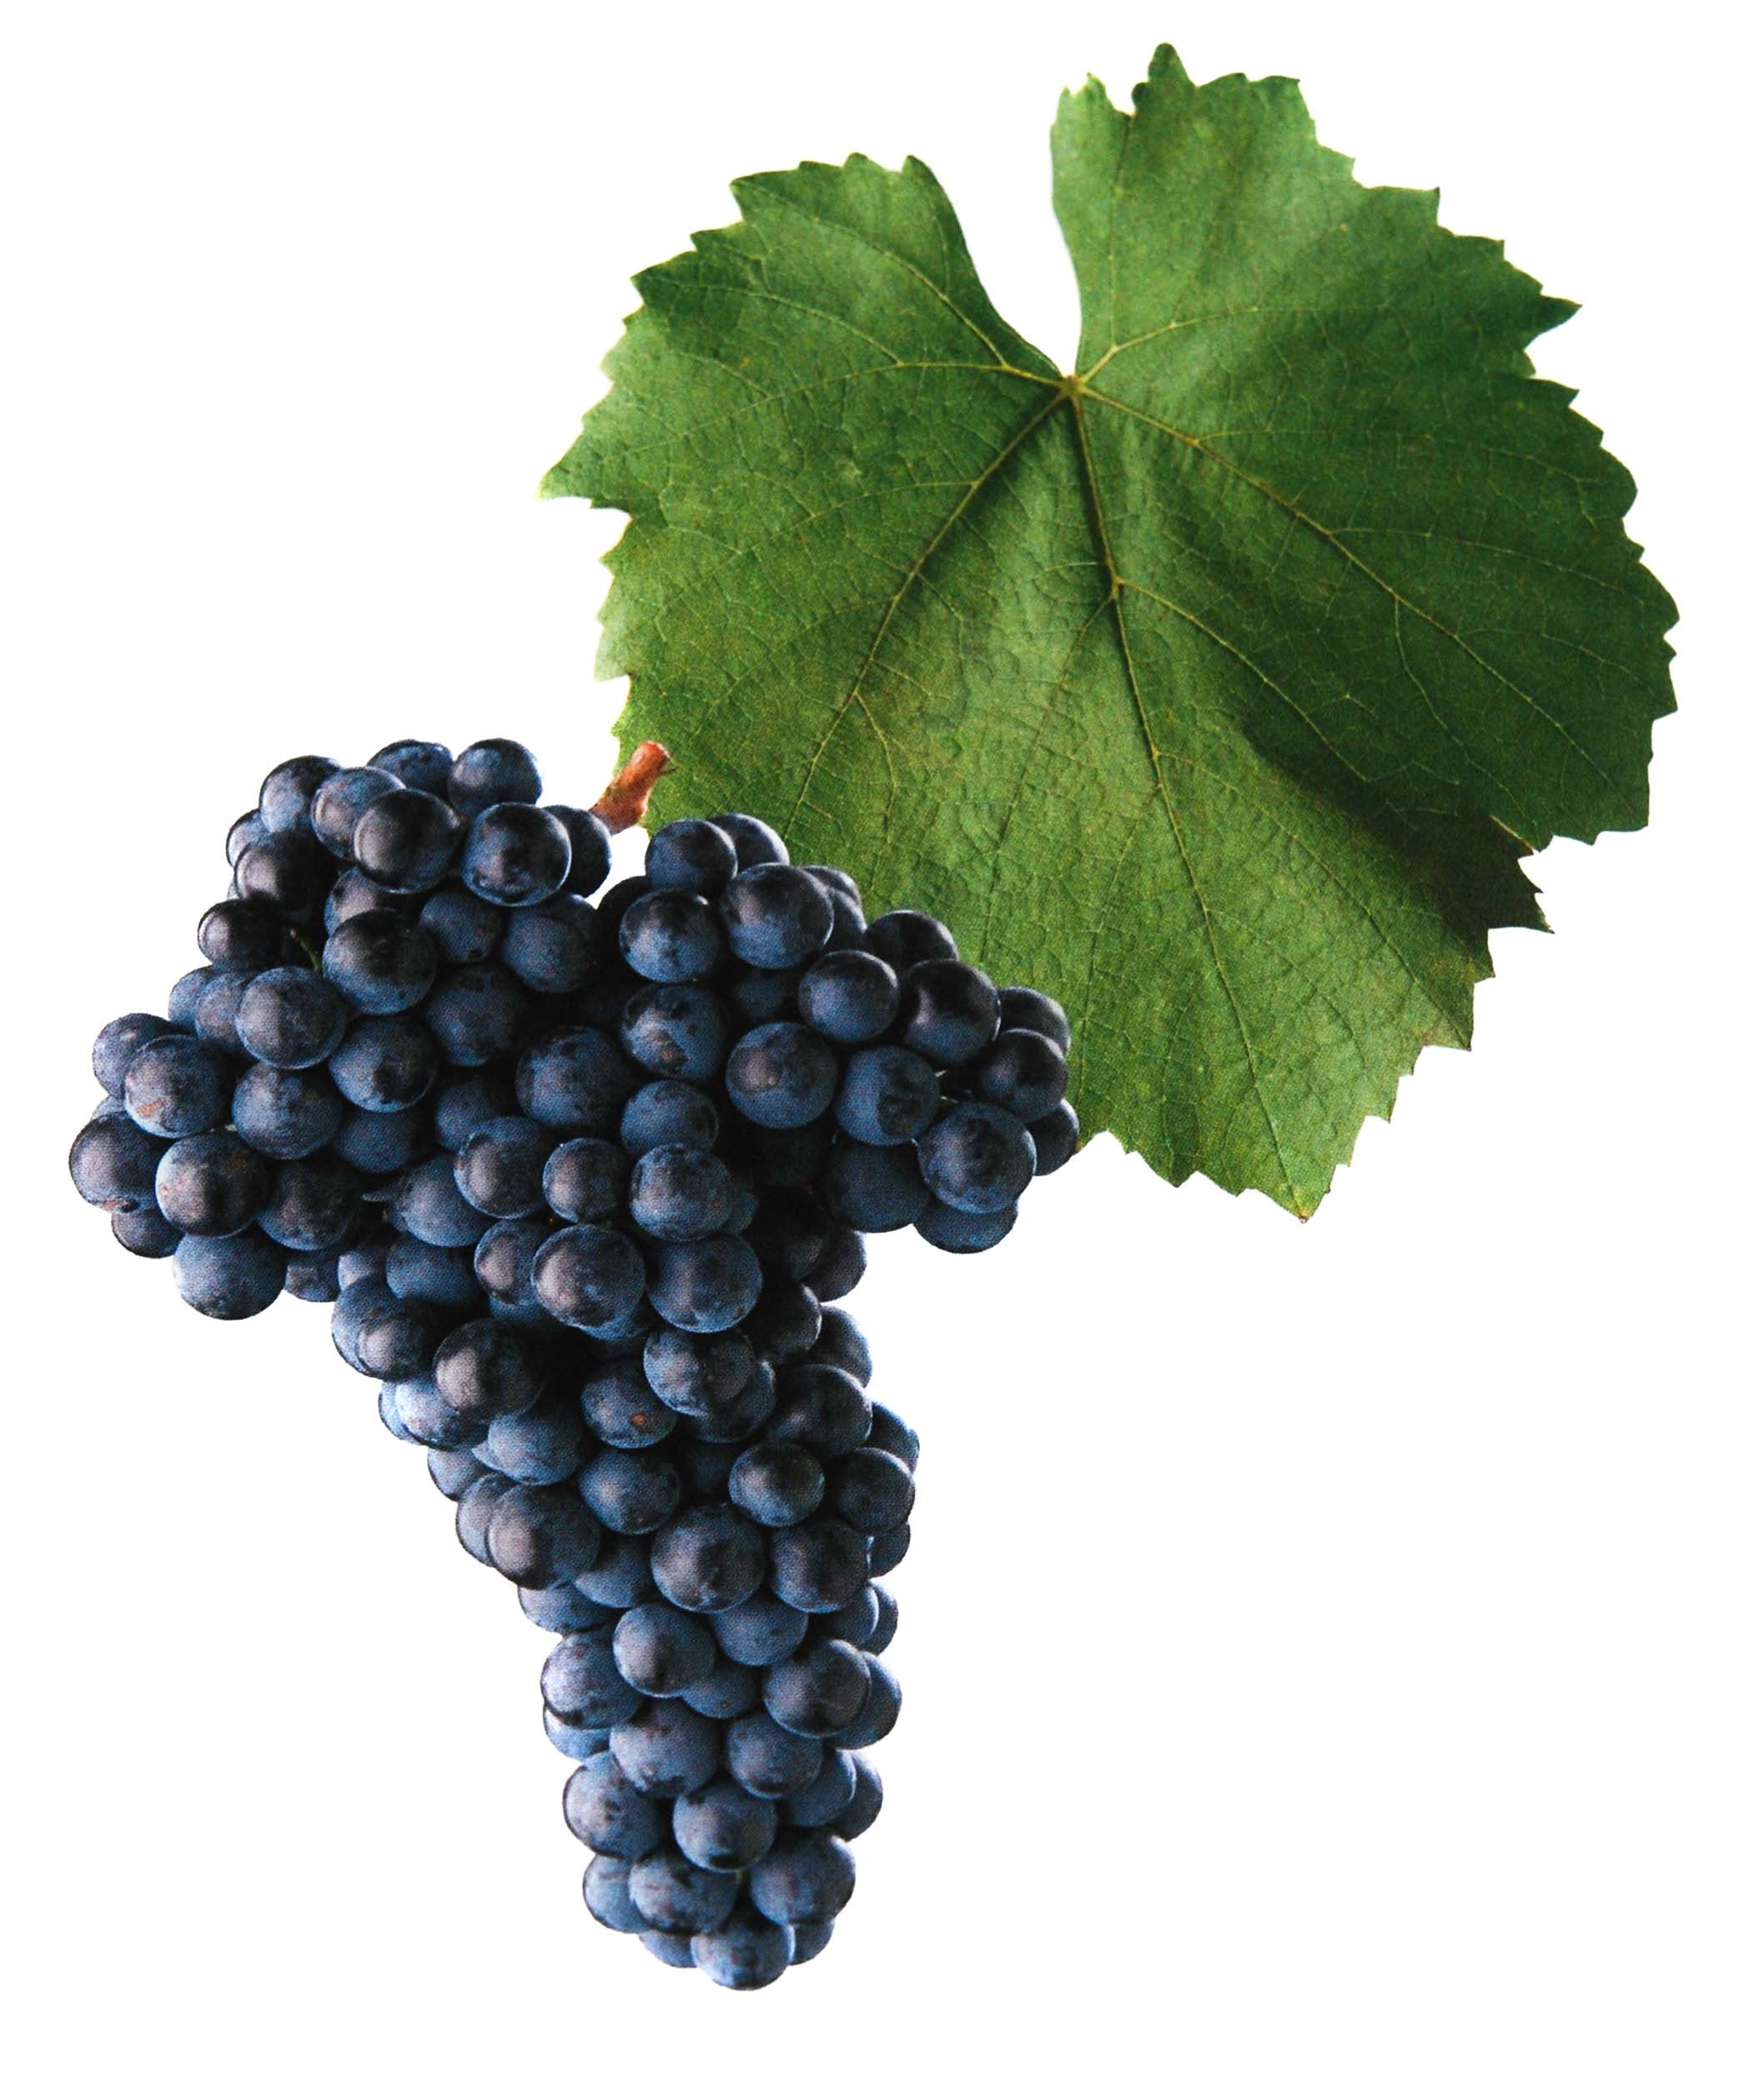 Frankovka rosé víno hrozen a list